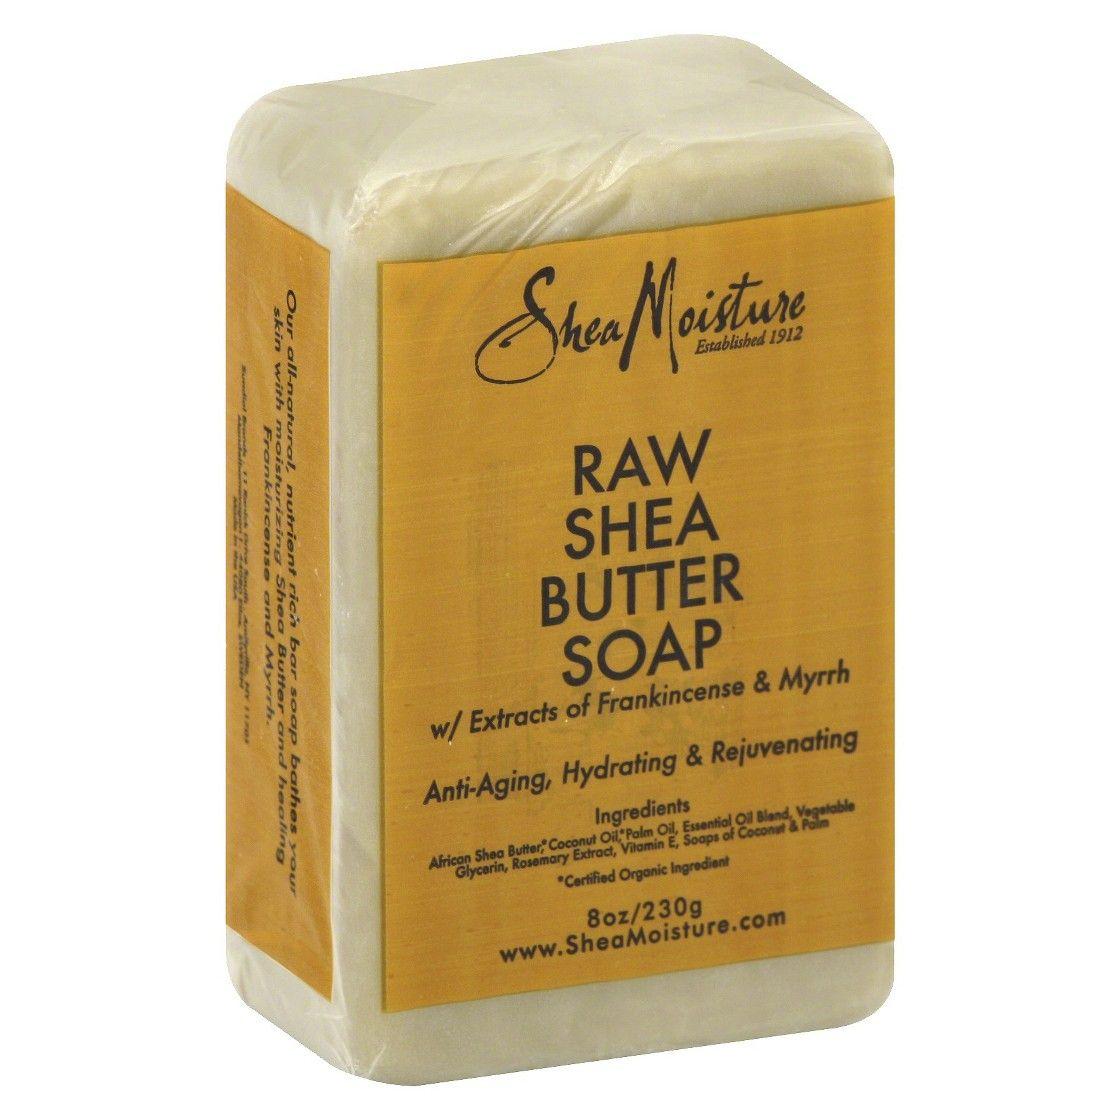 SheaMoisture Raw Shea Butter Anti-Aging Face and Body Bar ...